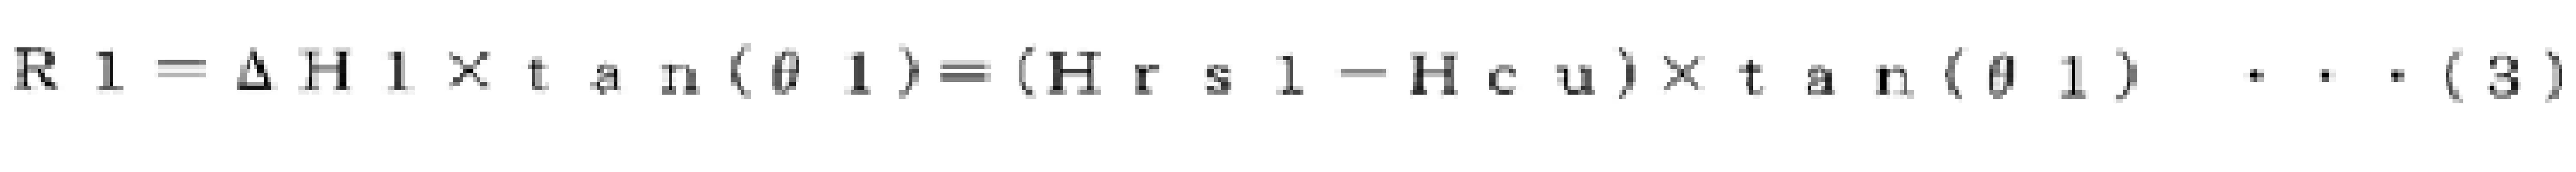 Figure 112019101508504-pct00003